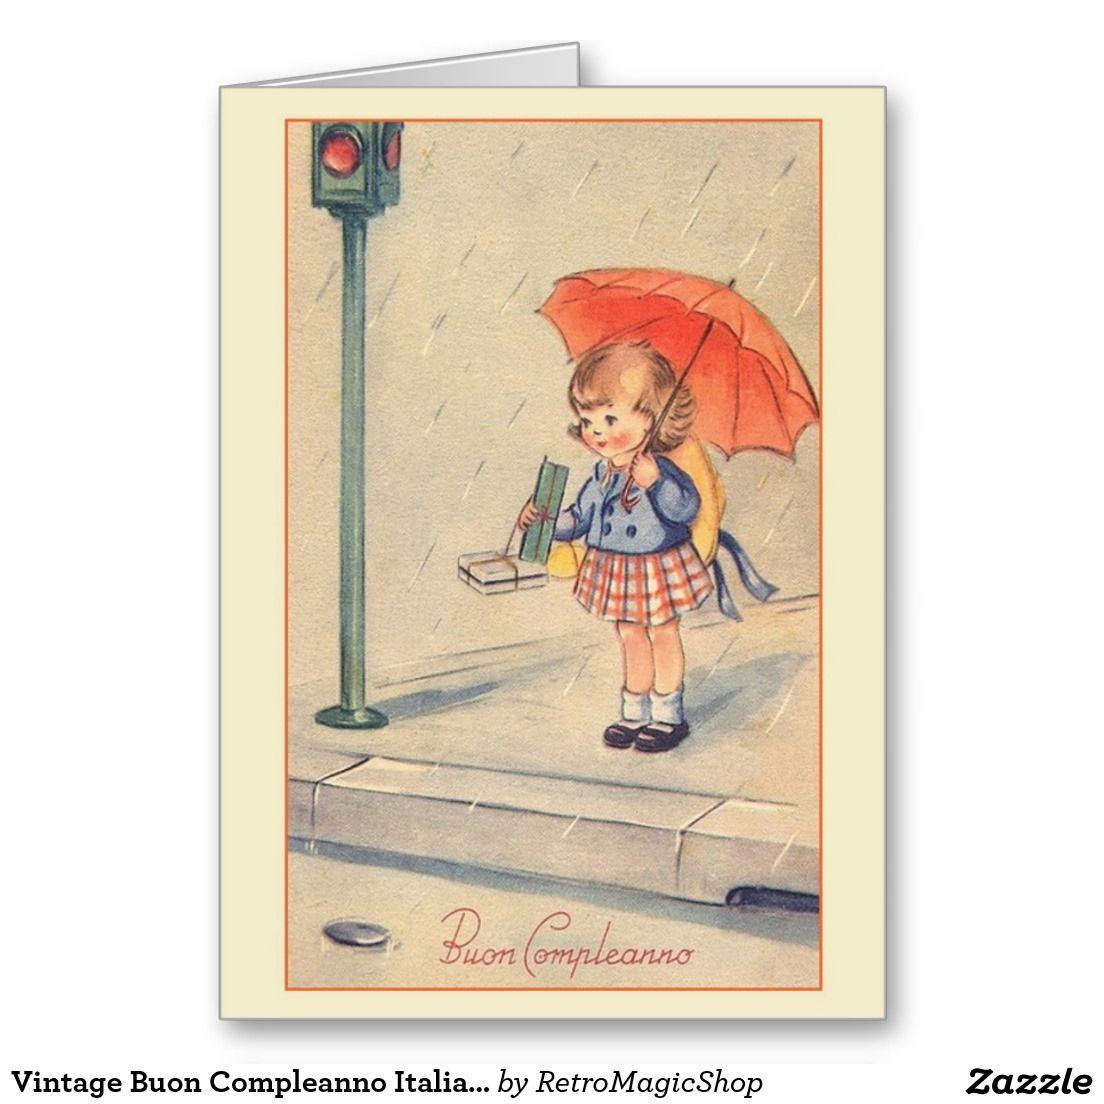 Vintage Buon Compleanno Italian Birthday Card